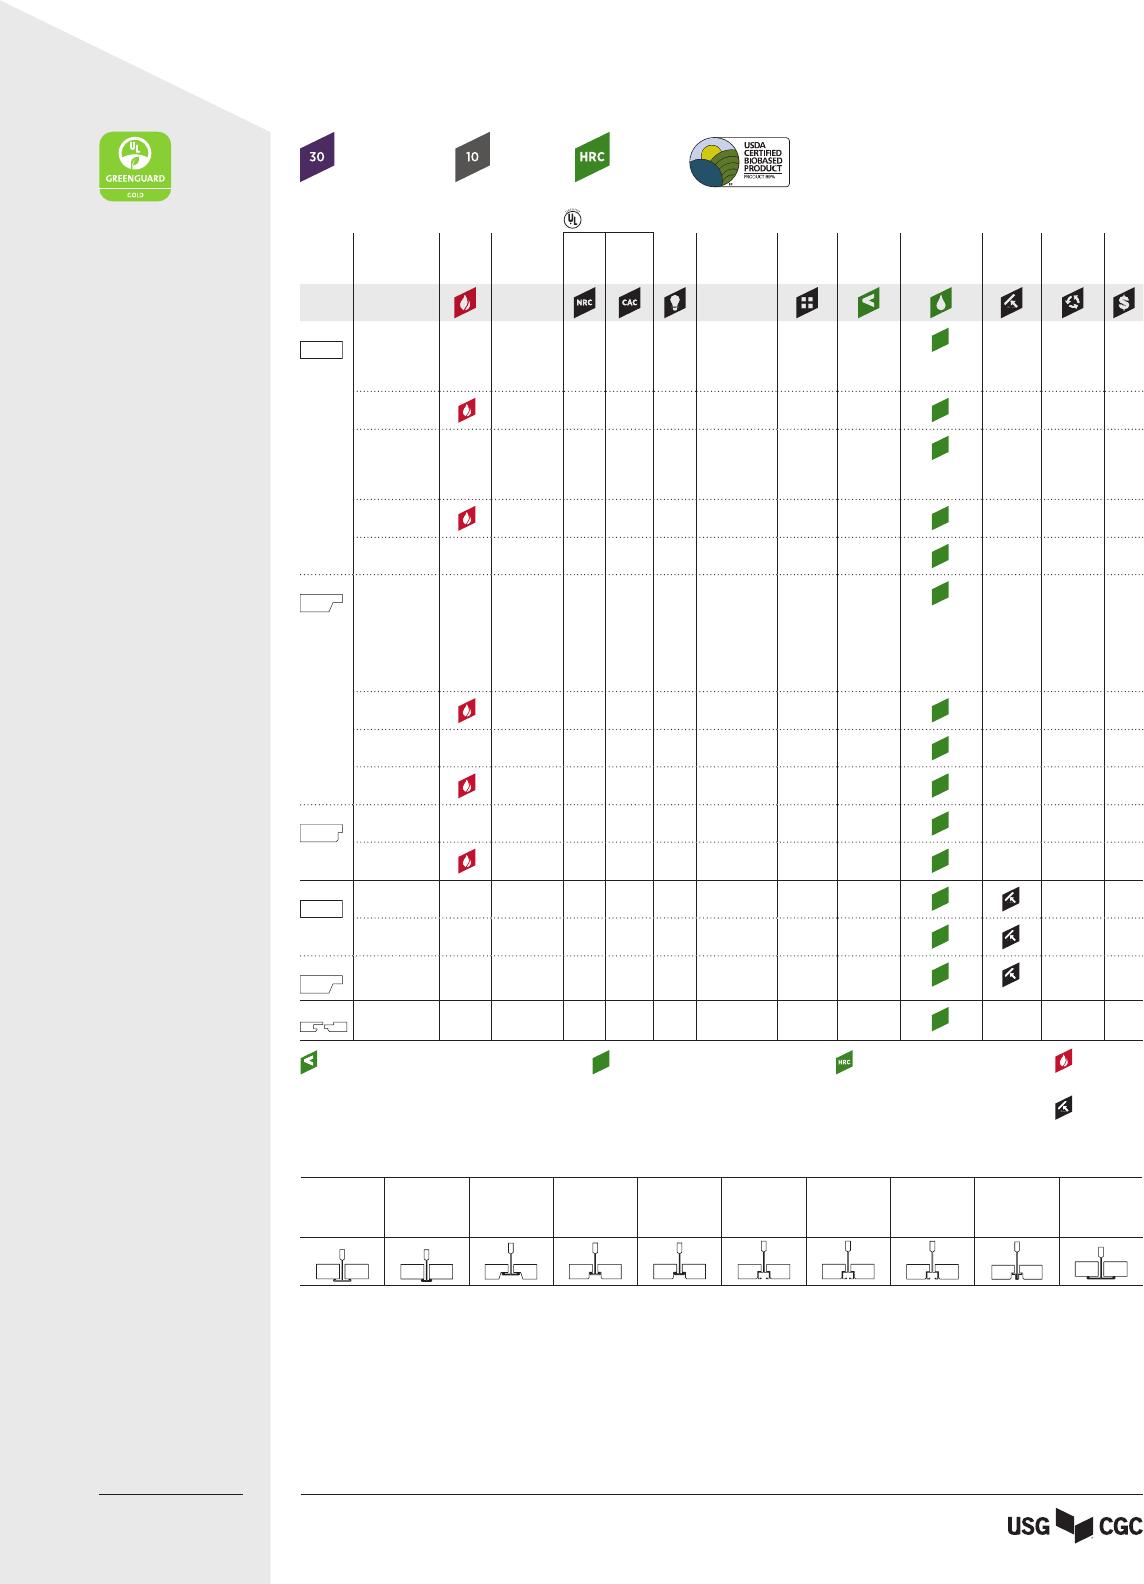 Usg Radar Ceiling Panels Data Sheet English Sc2127 22211 Radar